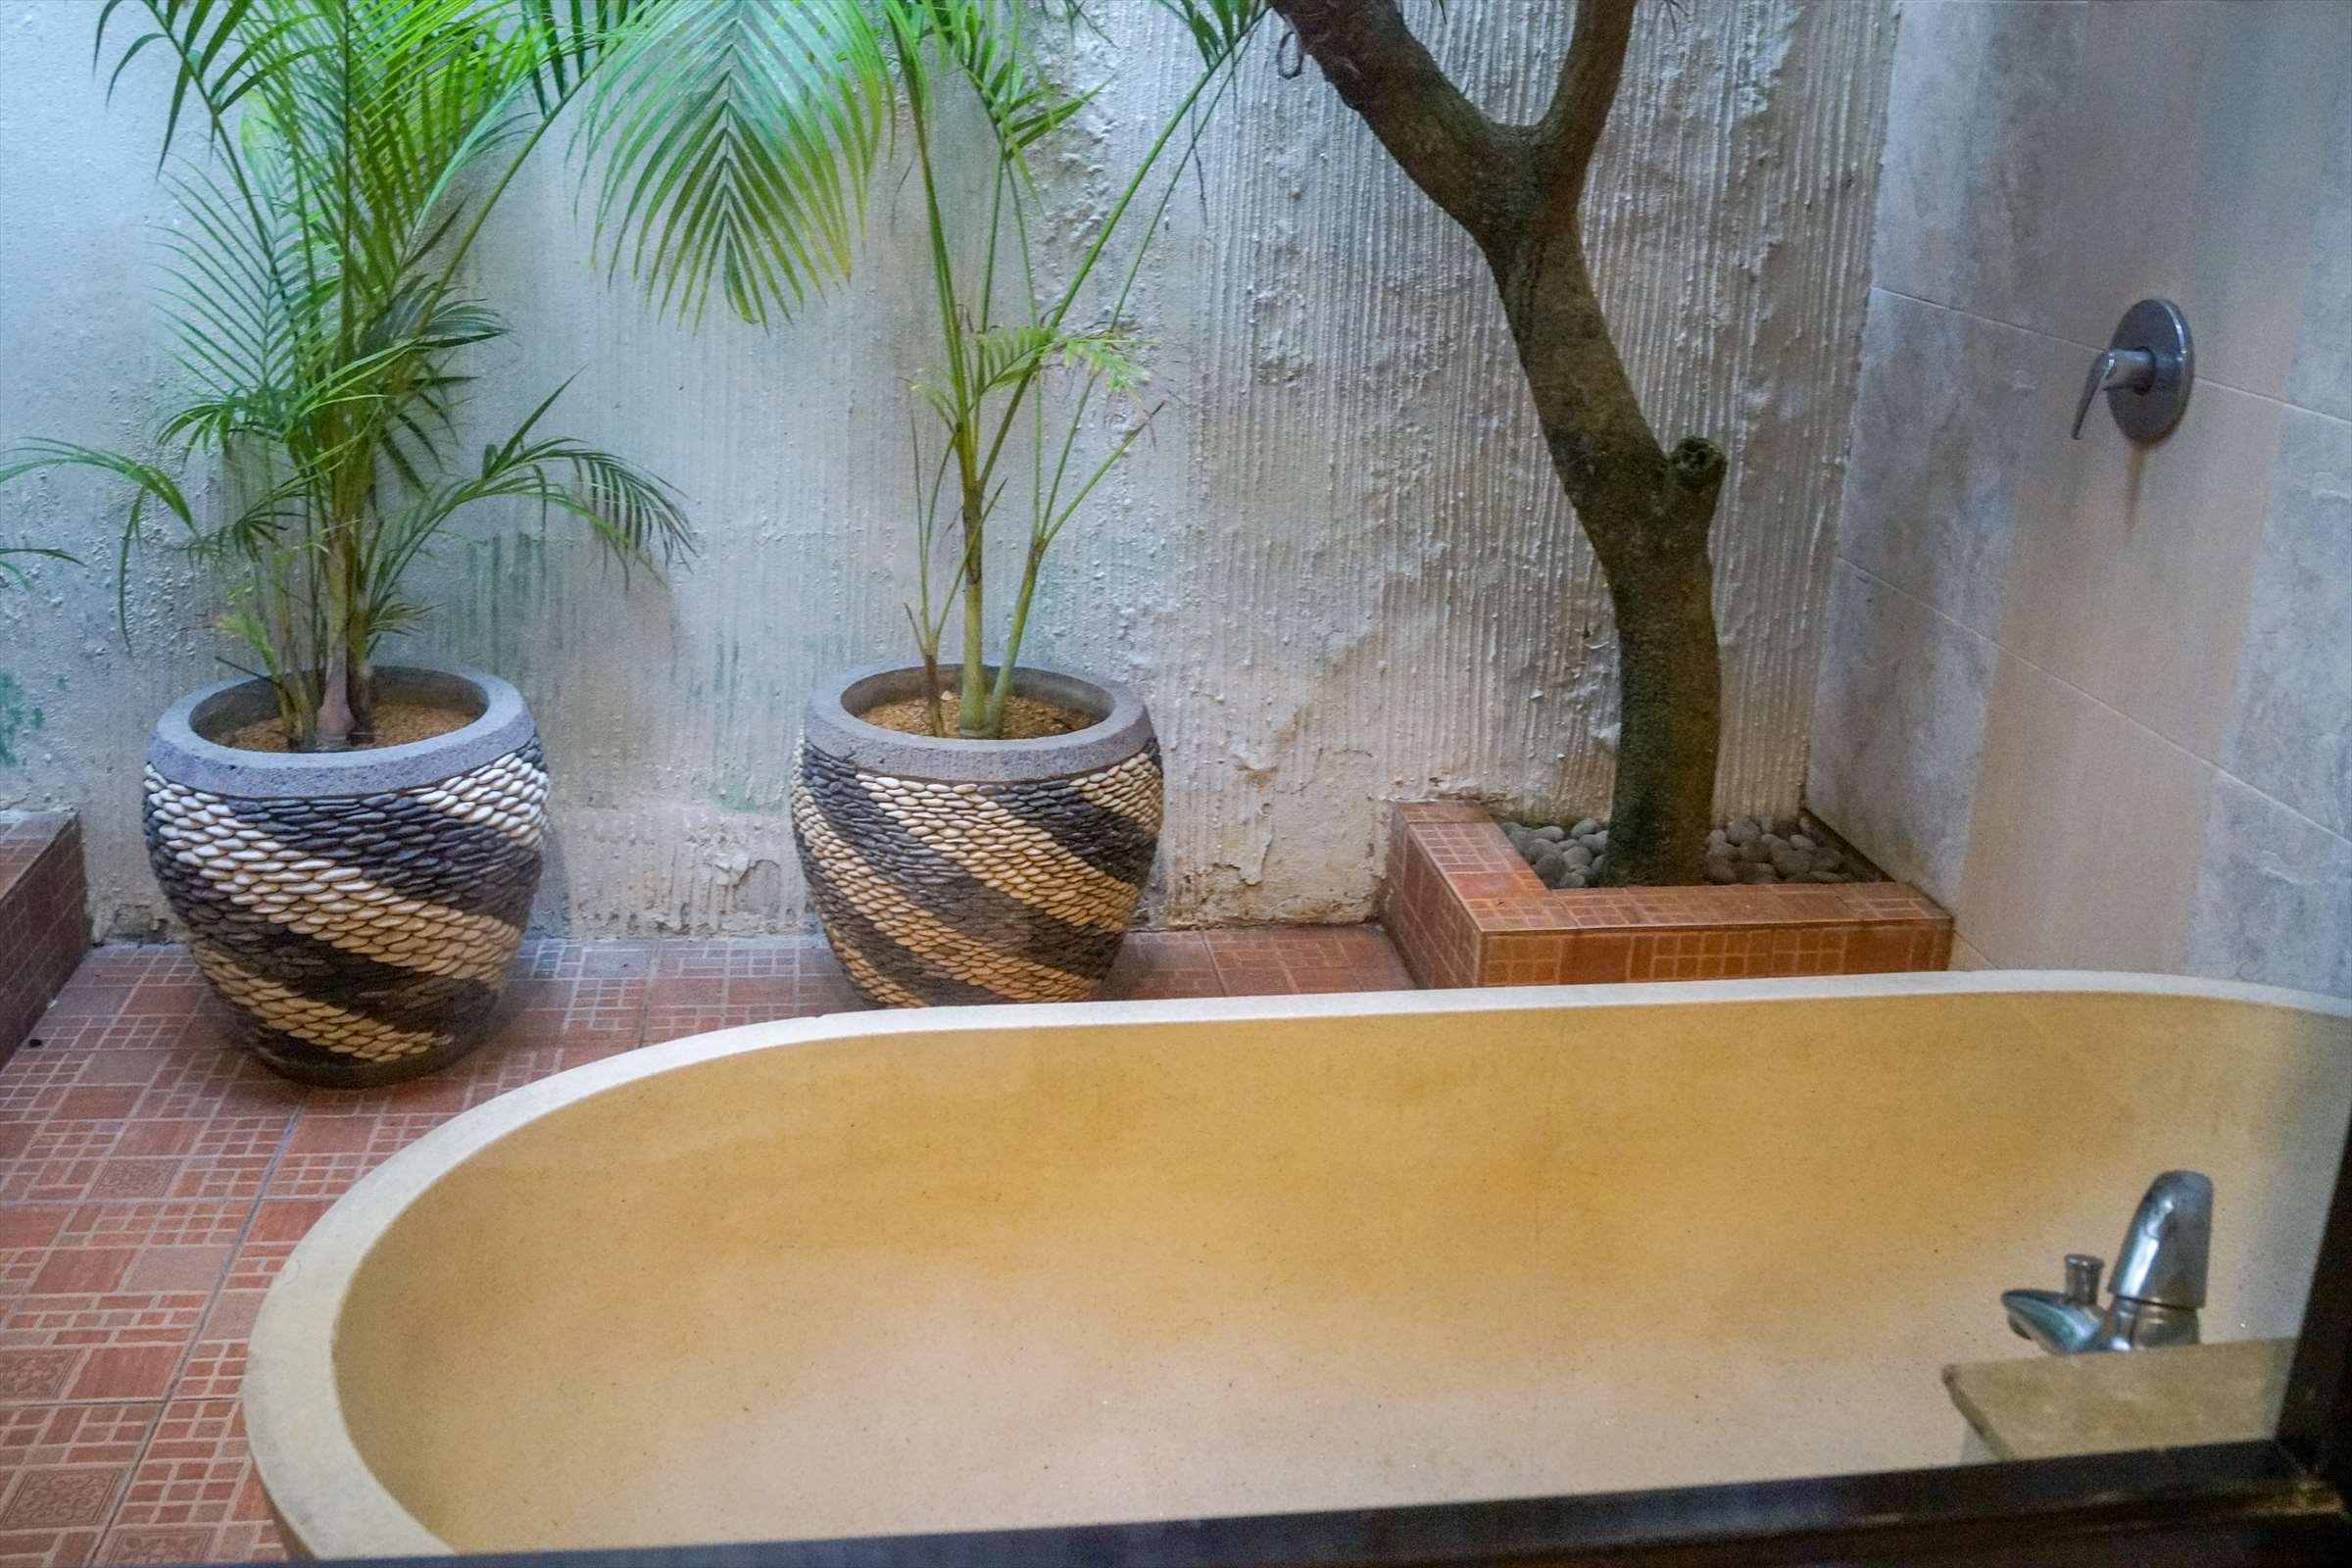 Bali Orchid Spa(オーキッド スパ)